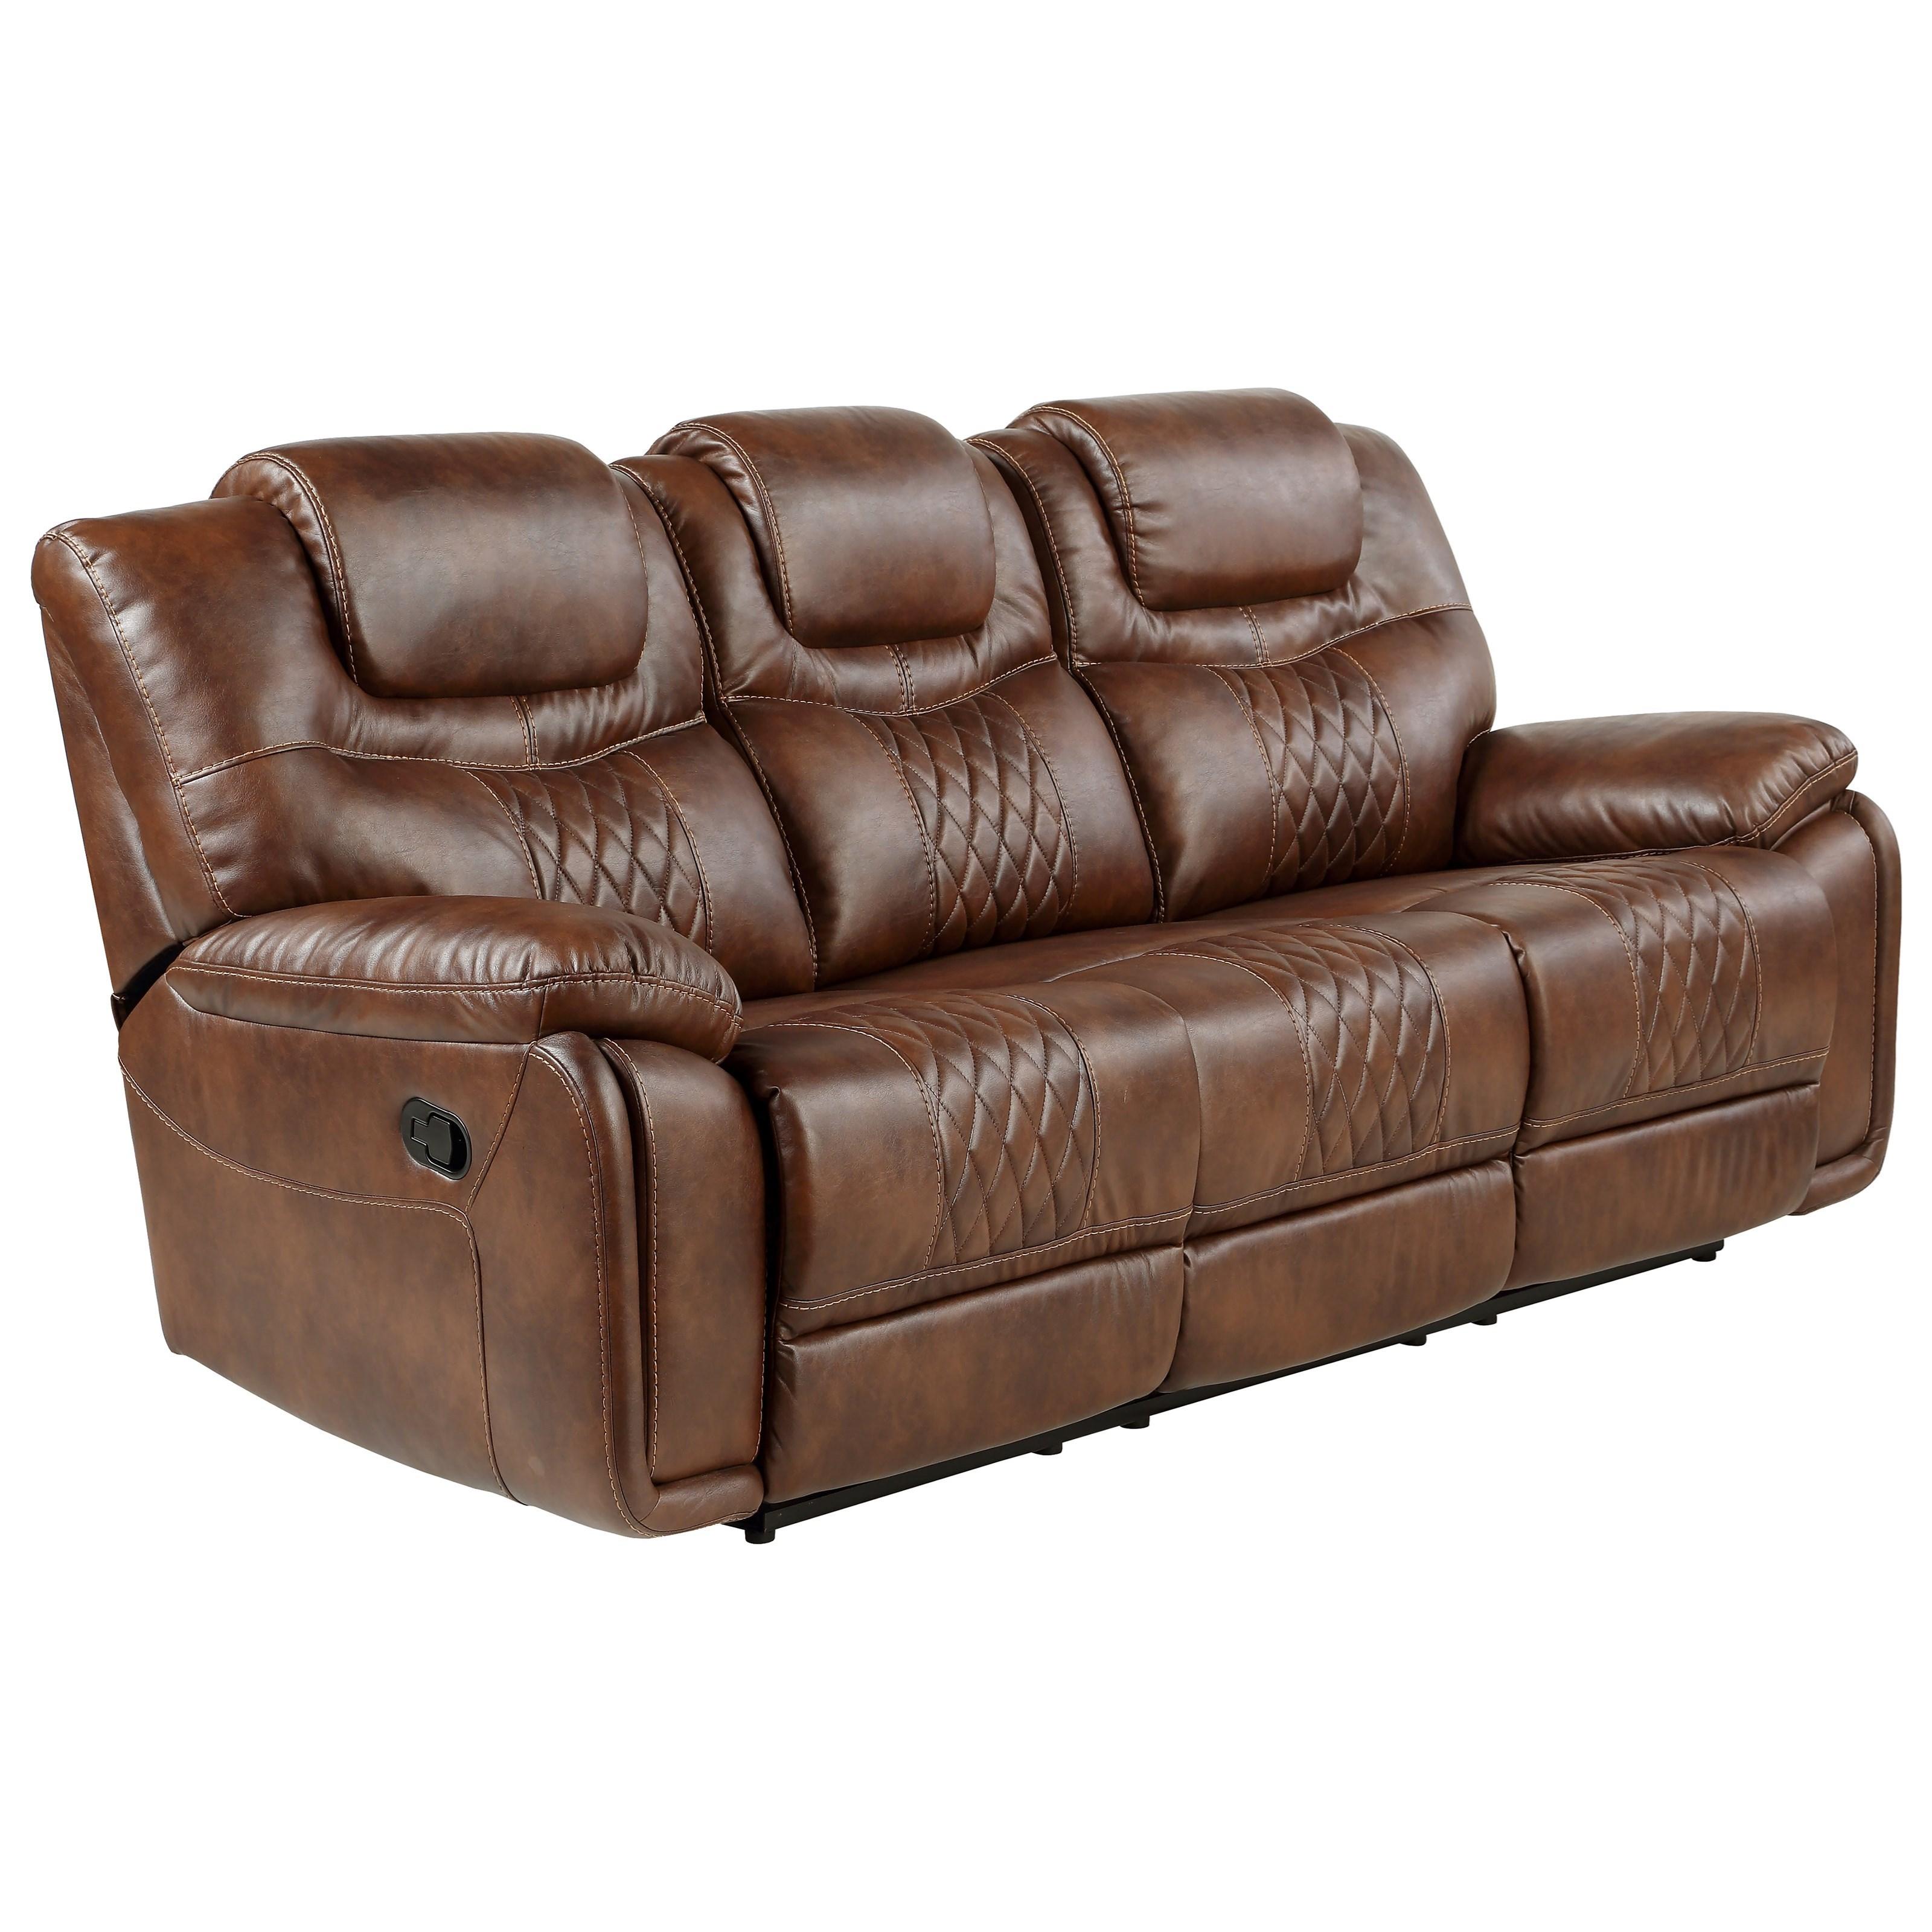 Boardwalk BK Manual Reclining Sofa by Steve Silver at Smart Buy Furniture